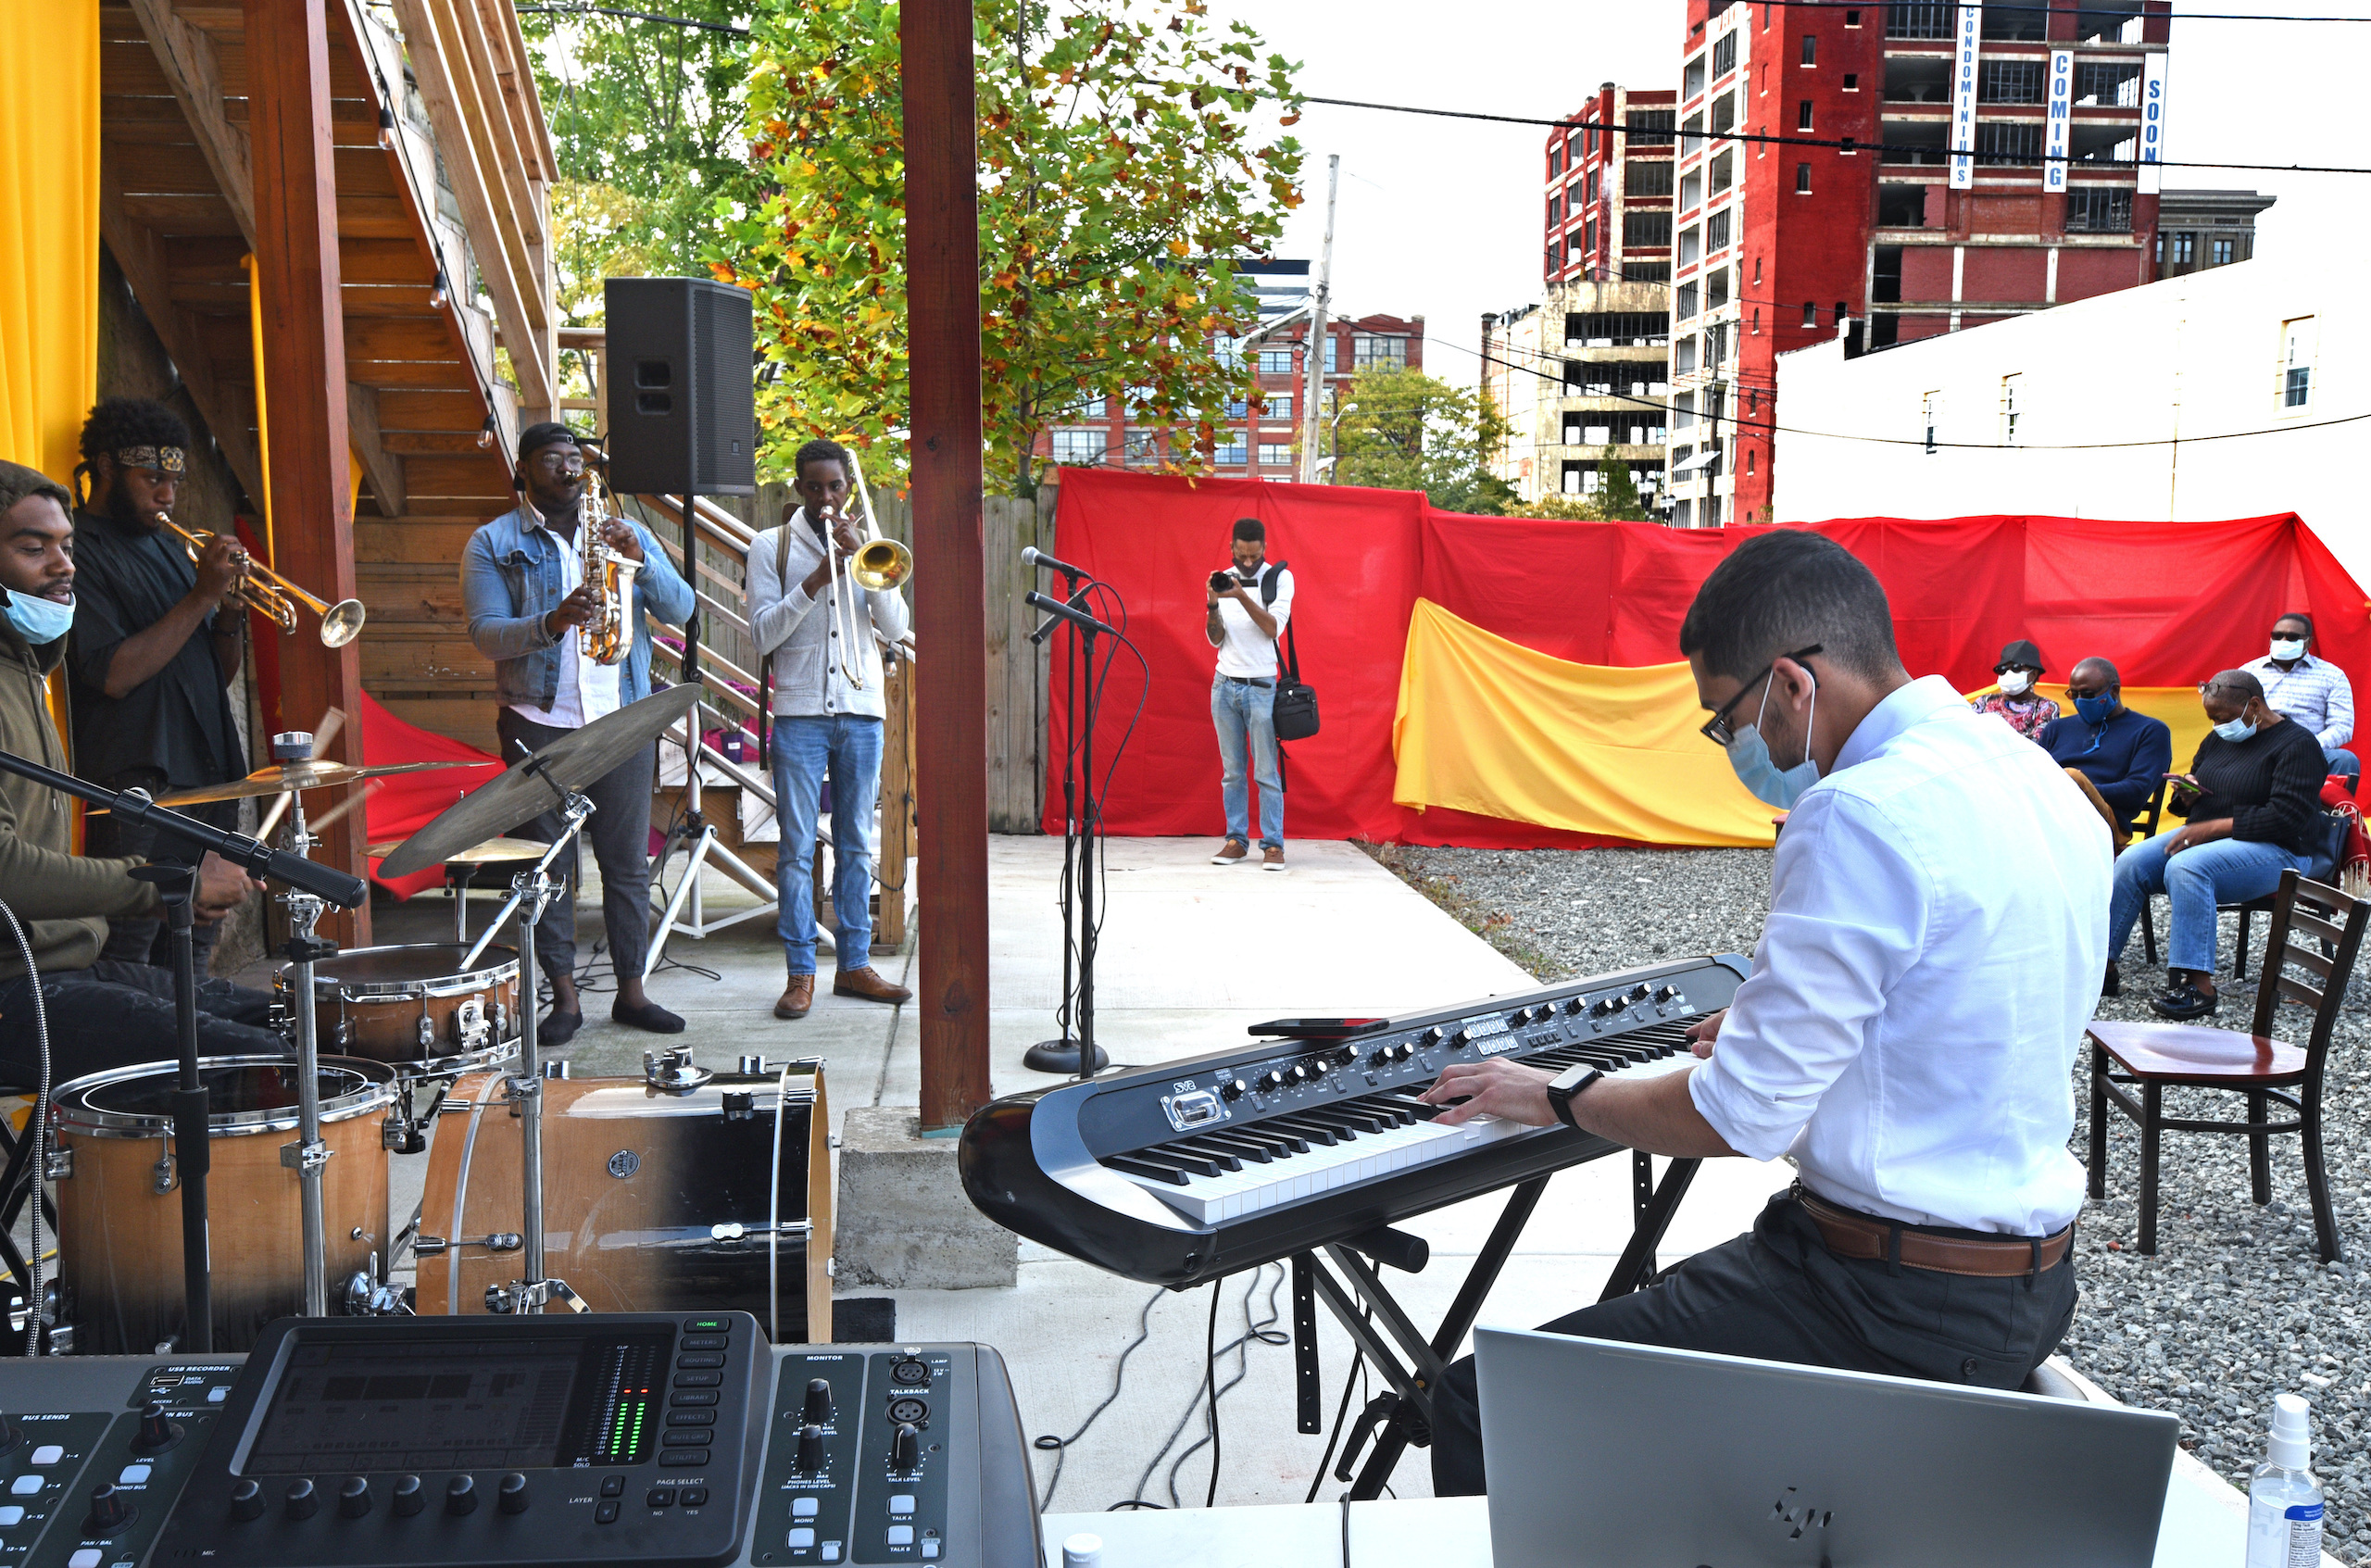 Jazz musicians perform in the IDEA Center's backyard